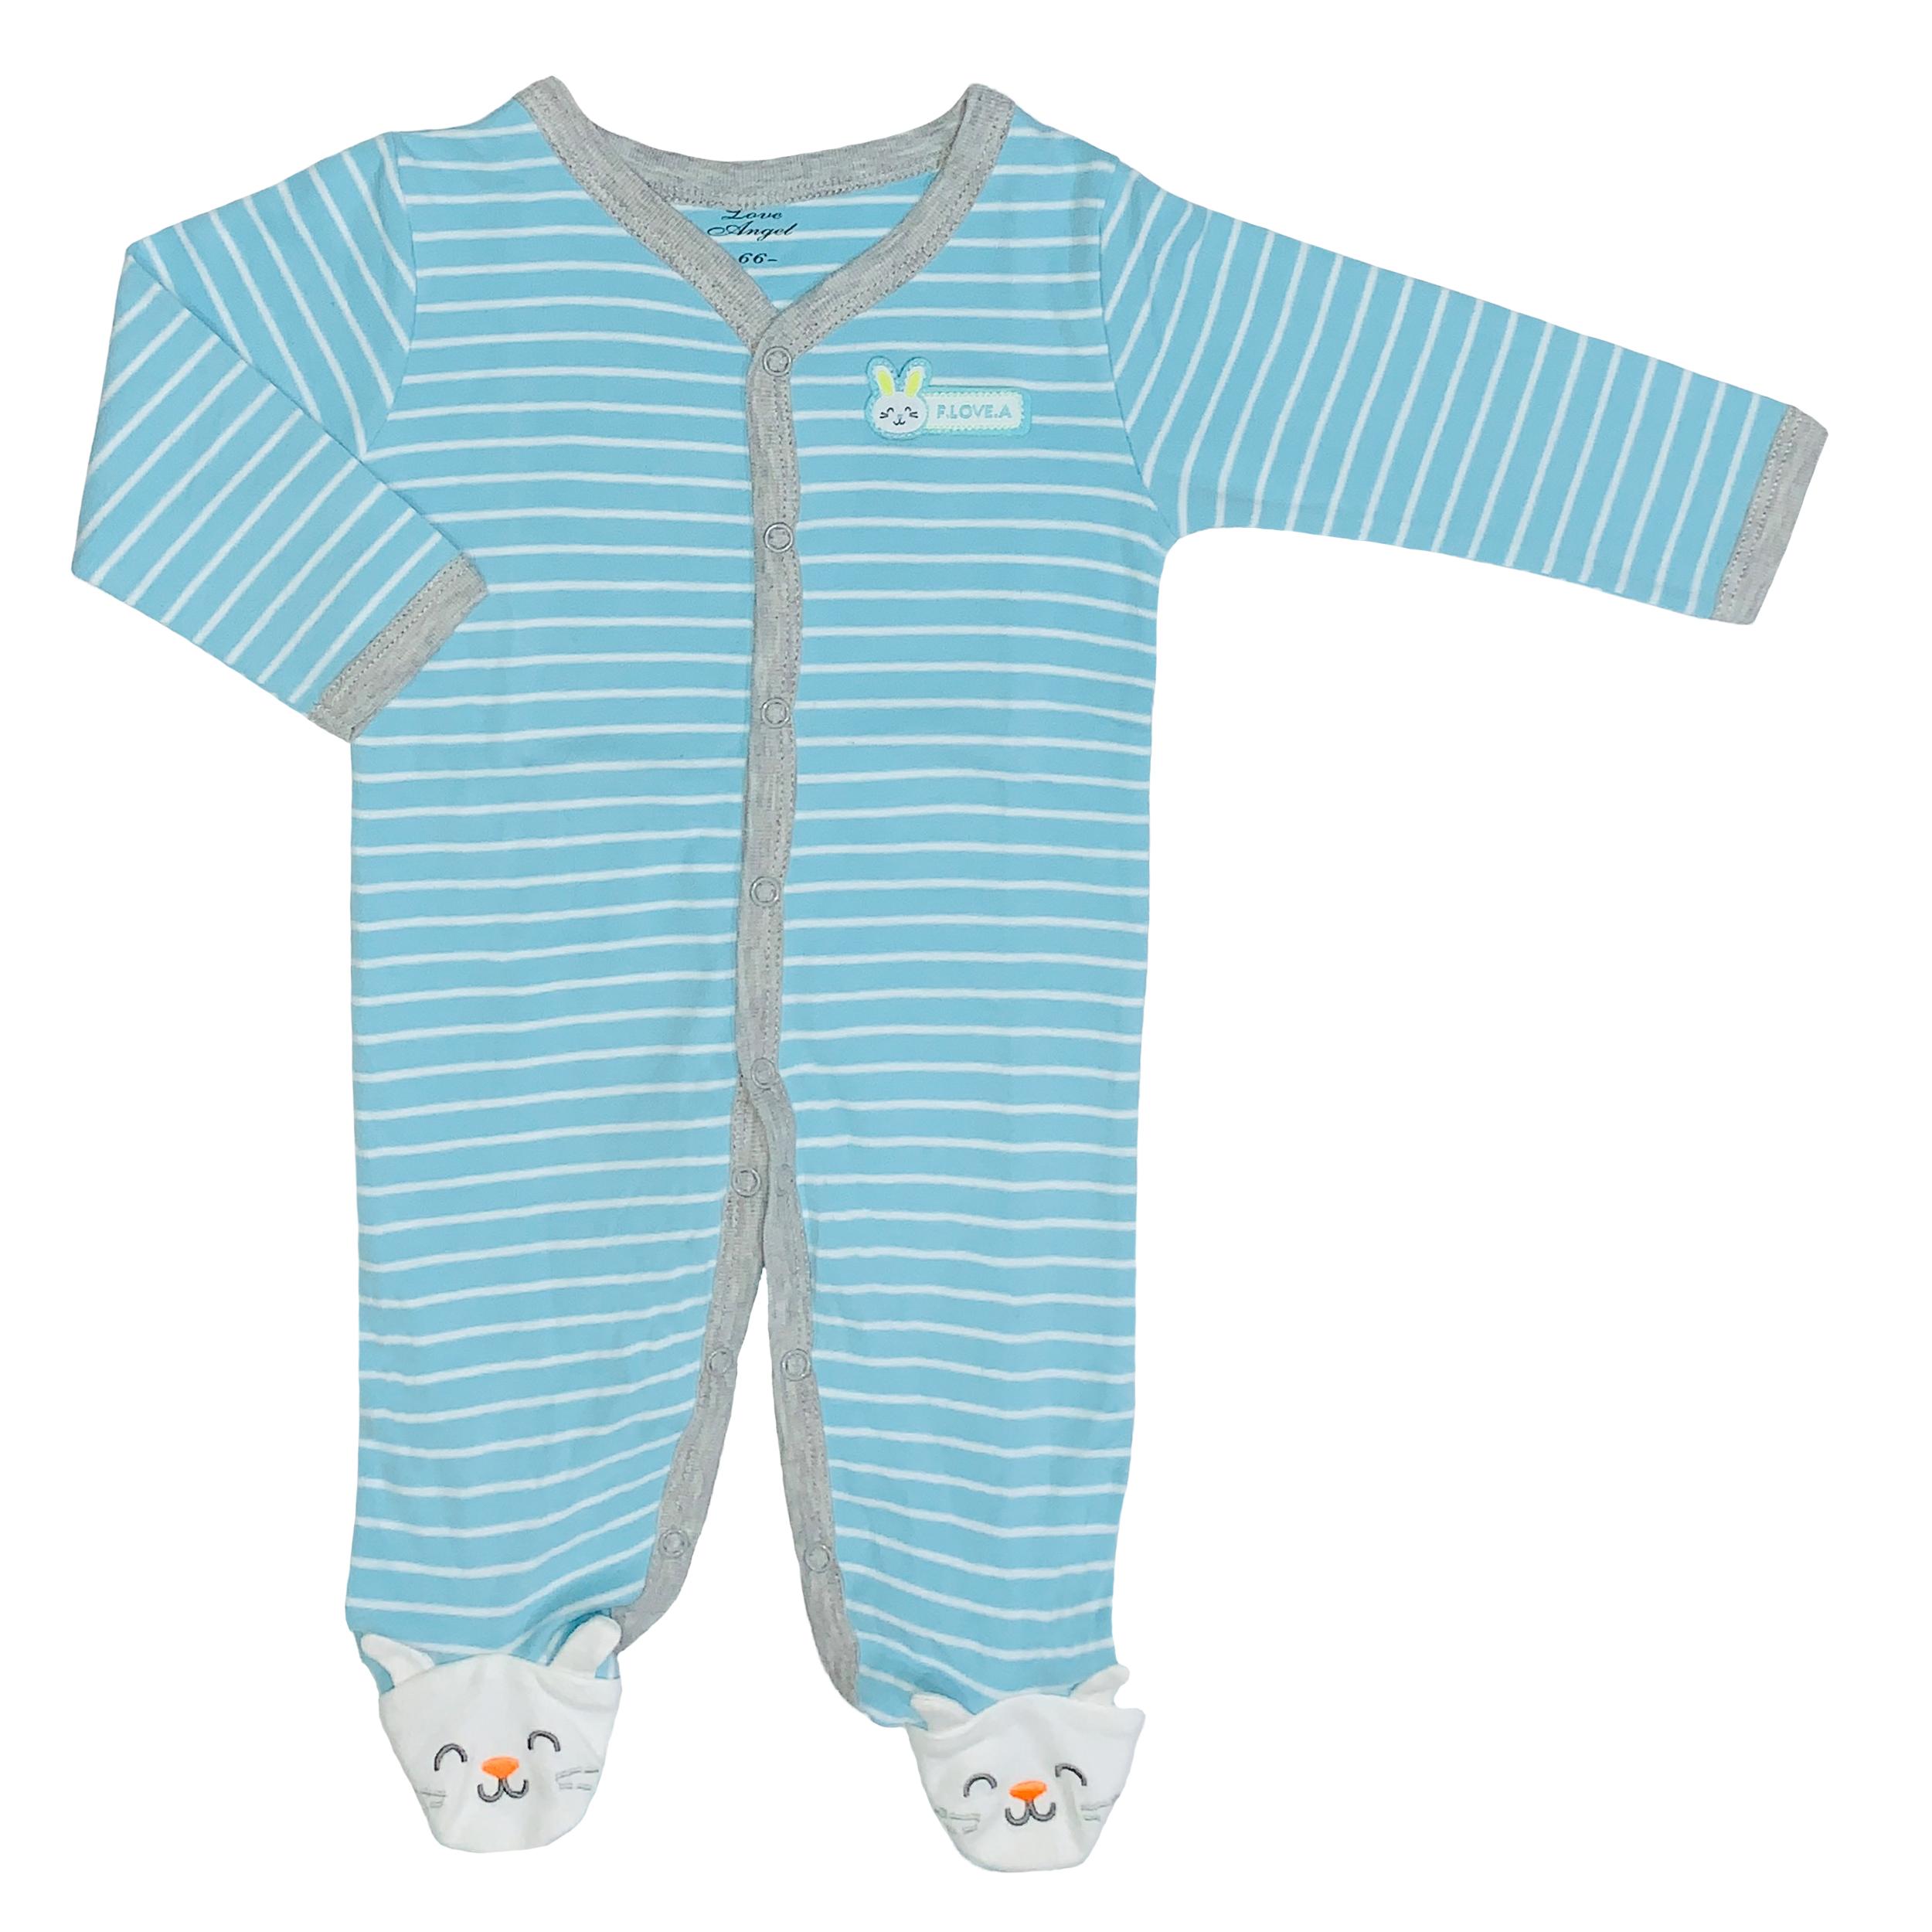 سرهمی نوزادی طرح خرگوش کد FF-193